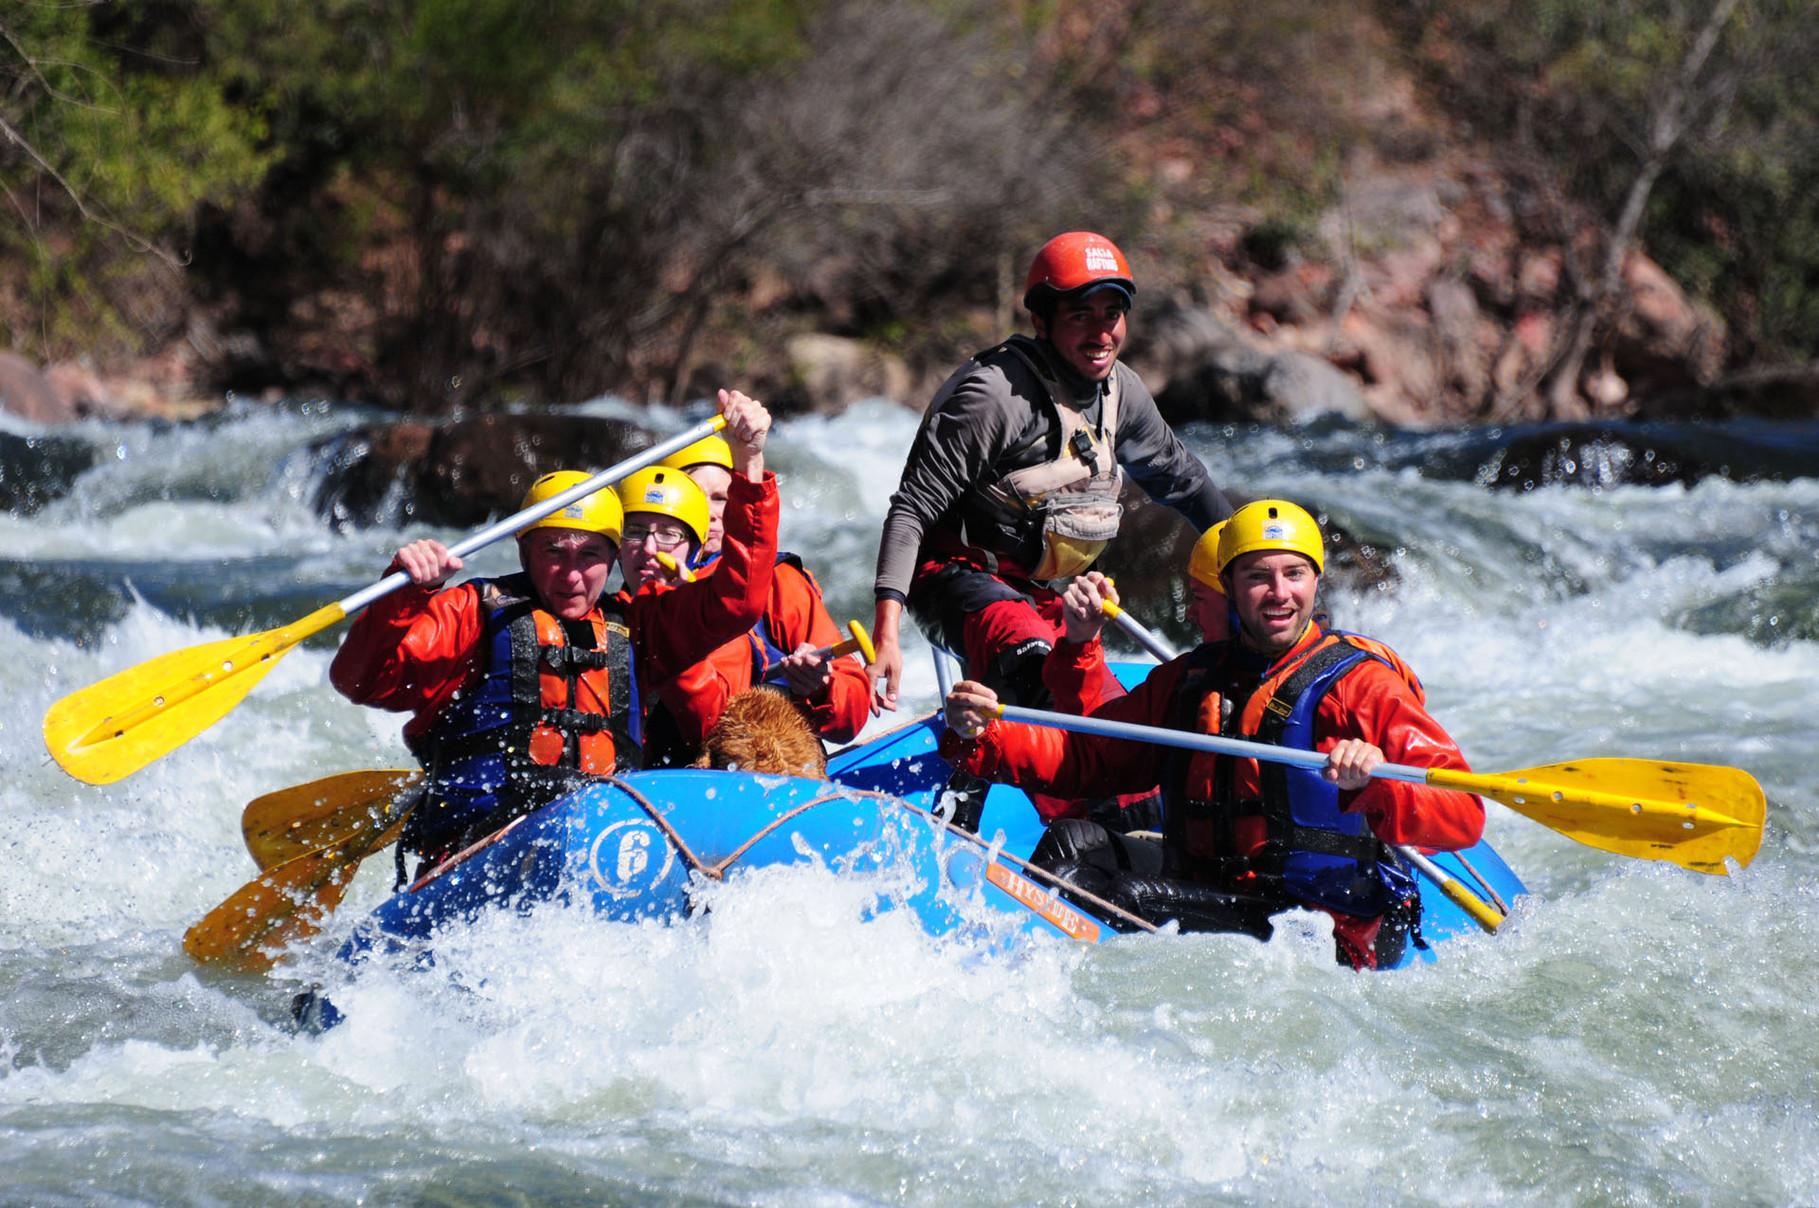 River rafting Rio Juramento, Salta, Argentina